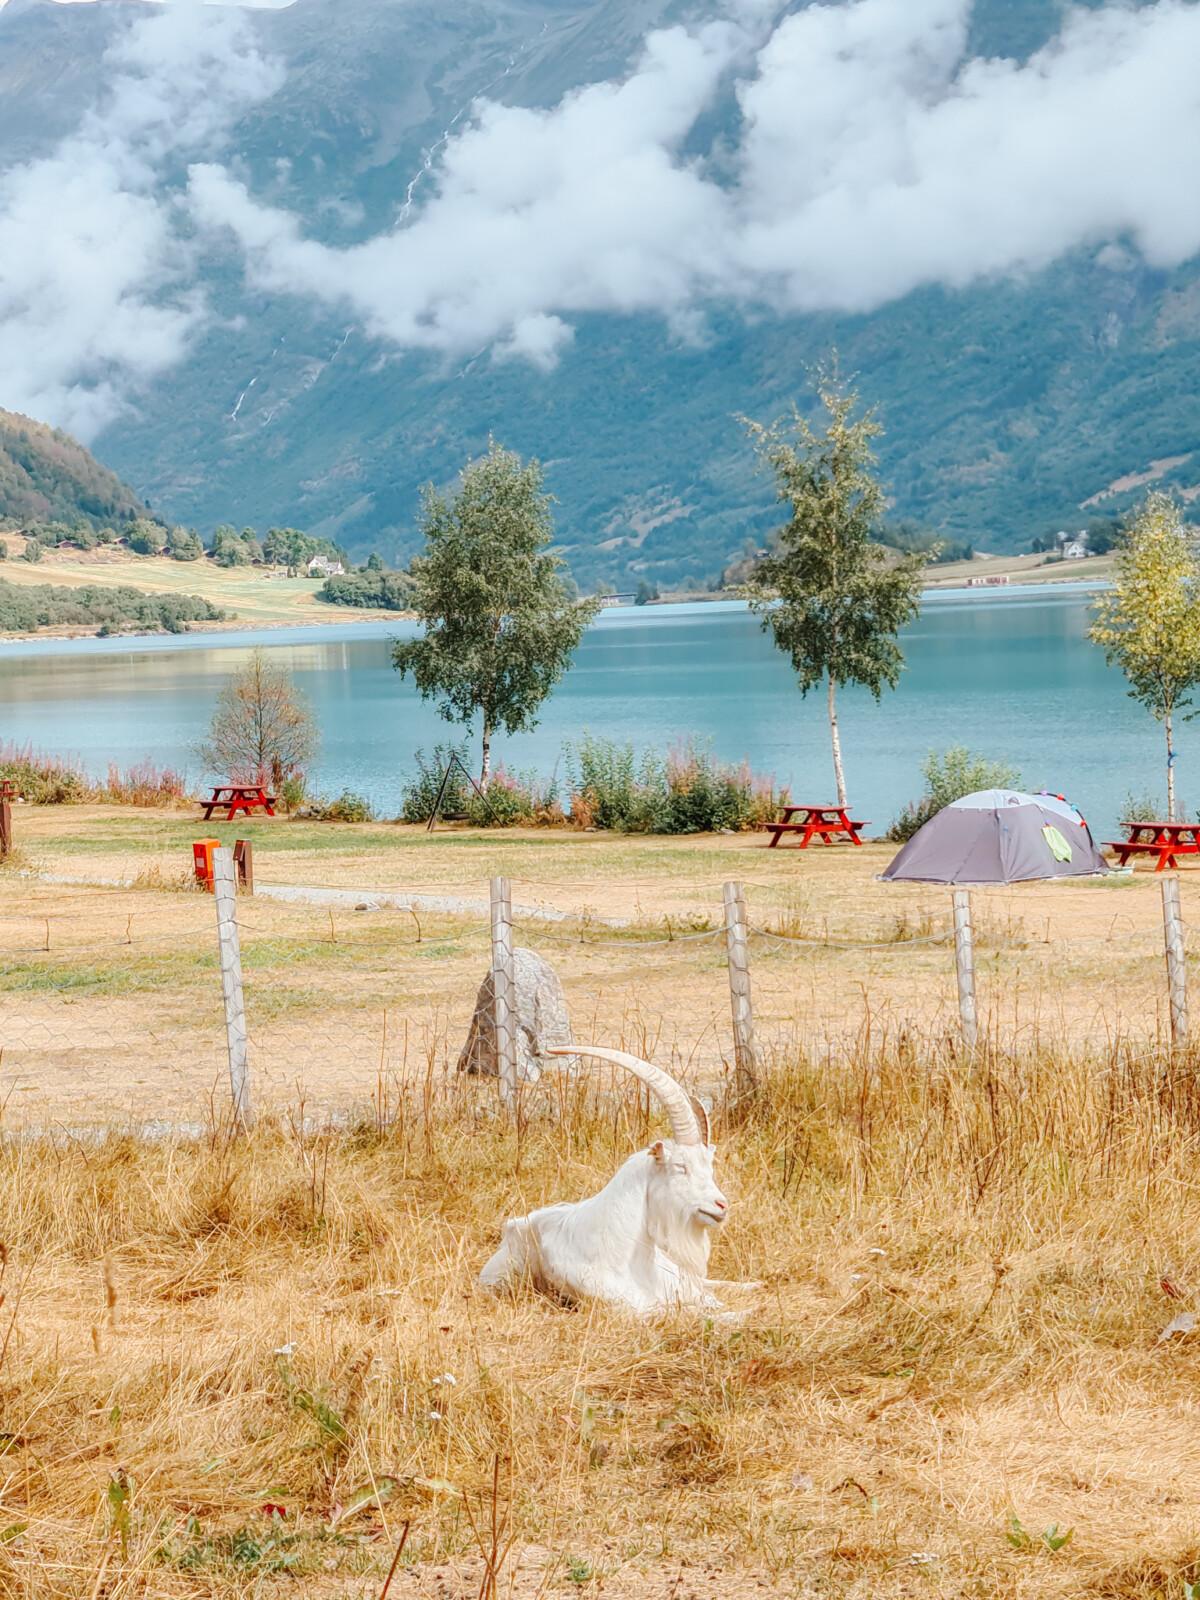 Gryta camping ved Oldevatnet